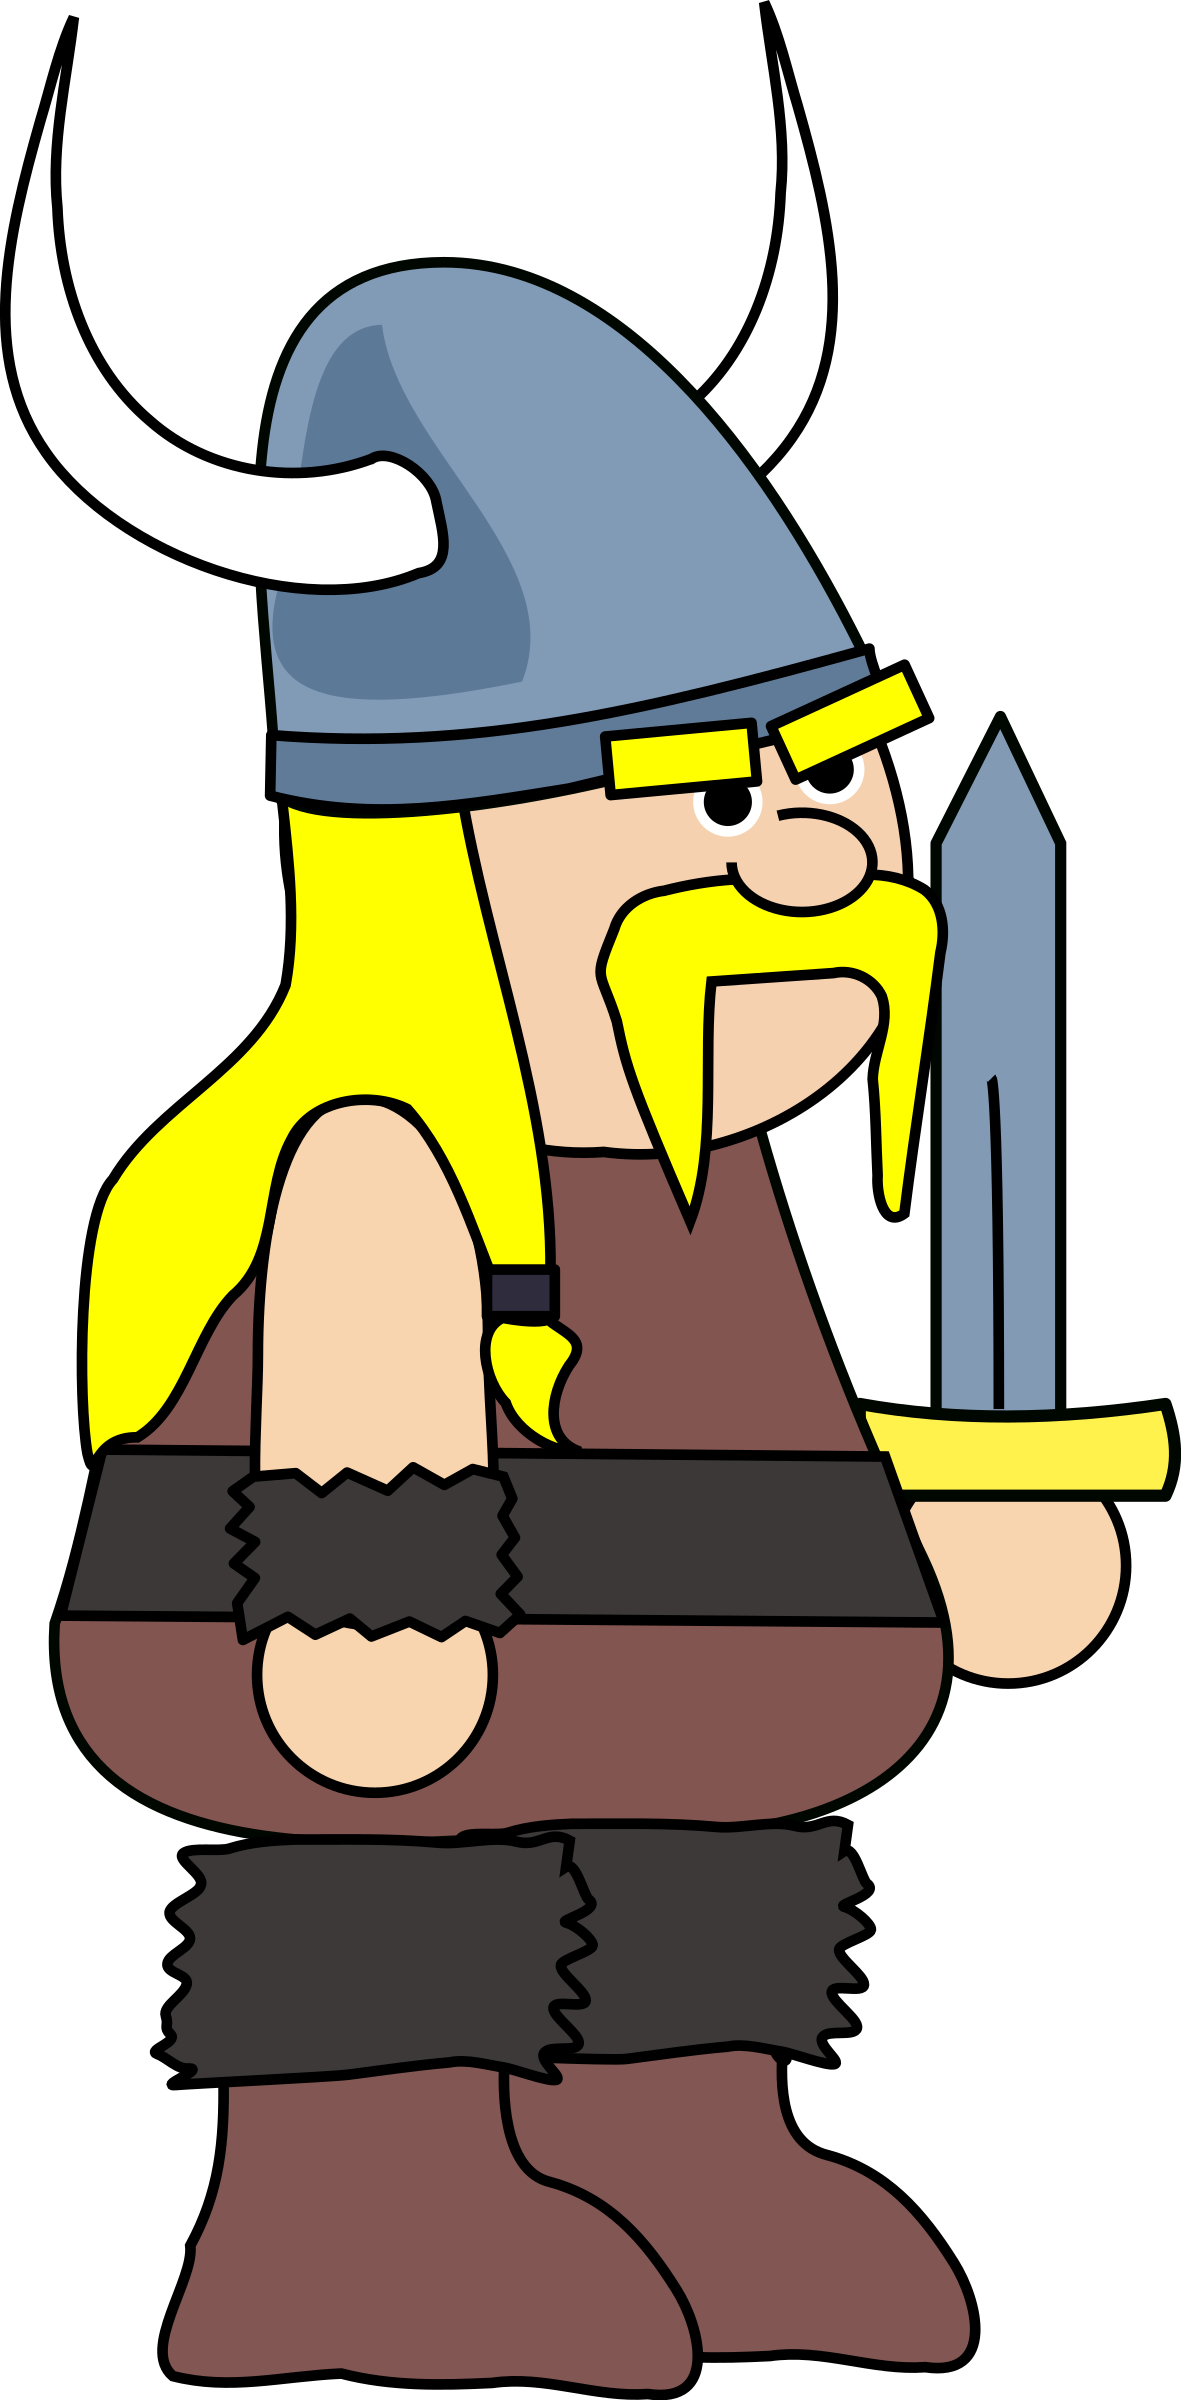 clipart transparent download Warrior big image png. Viking clipart